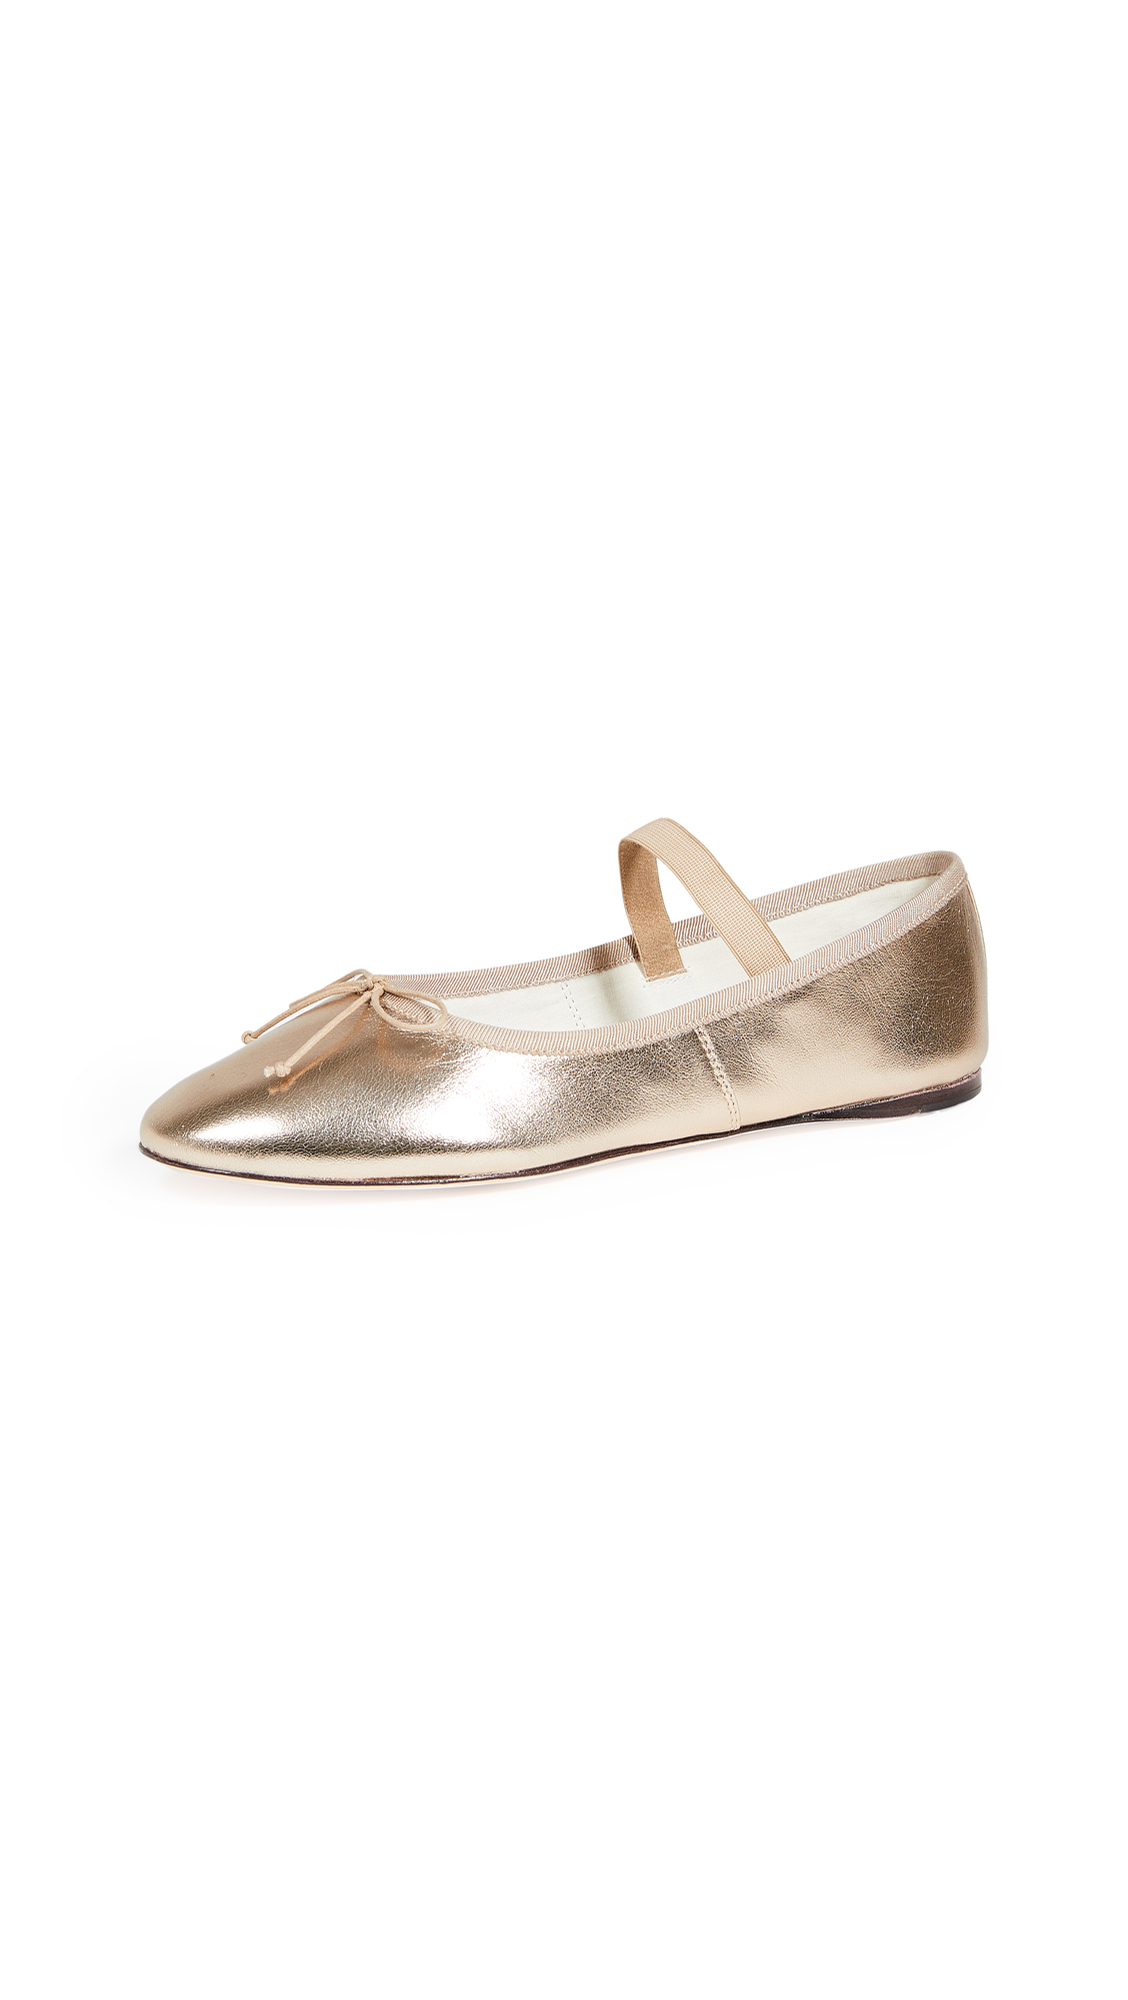 Buy Loeffler Randall Leonie Soft Ballet Flats online, shop Loeffler Randall